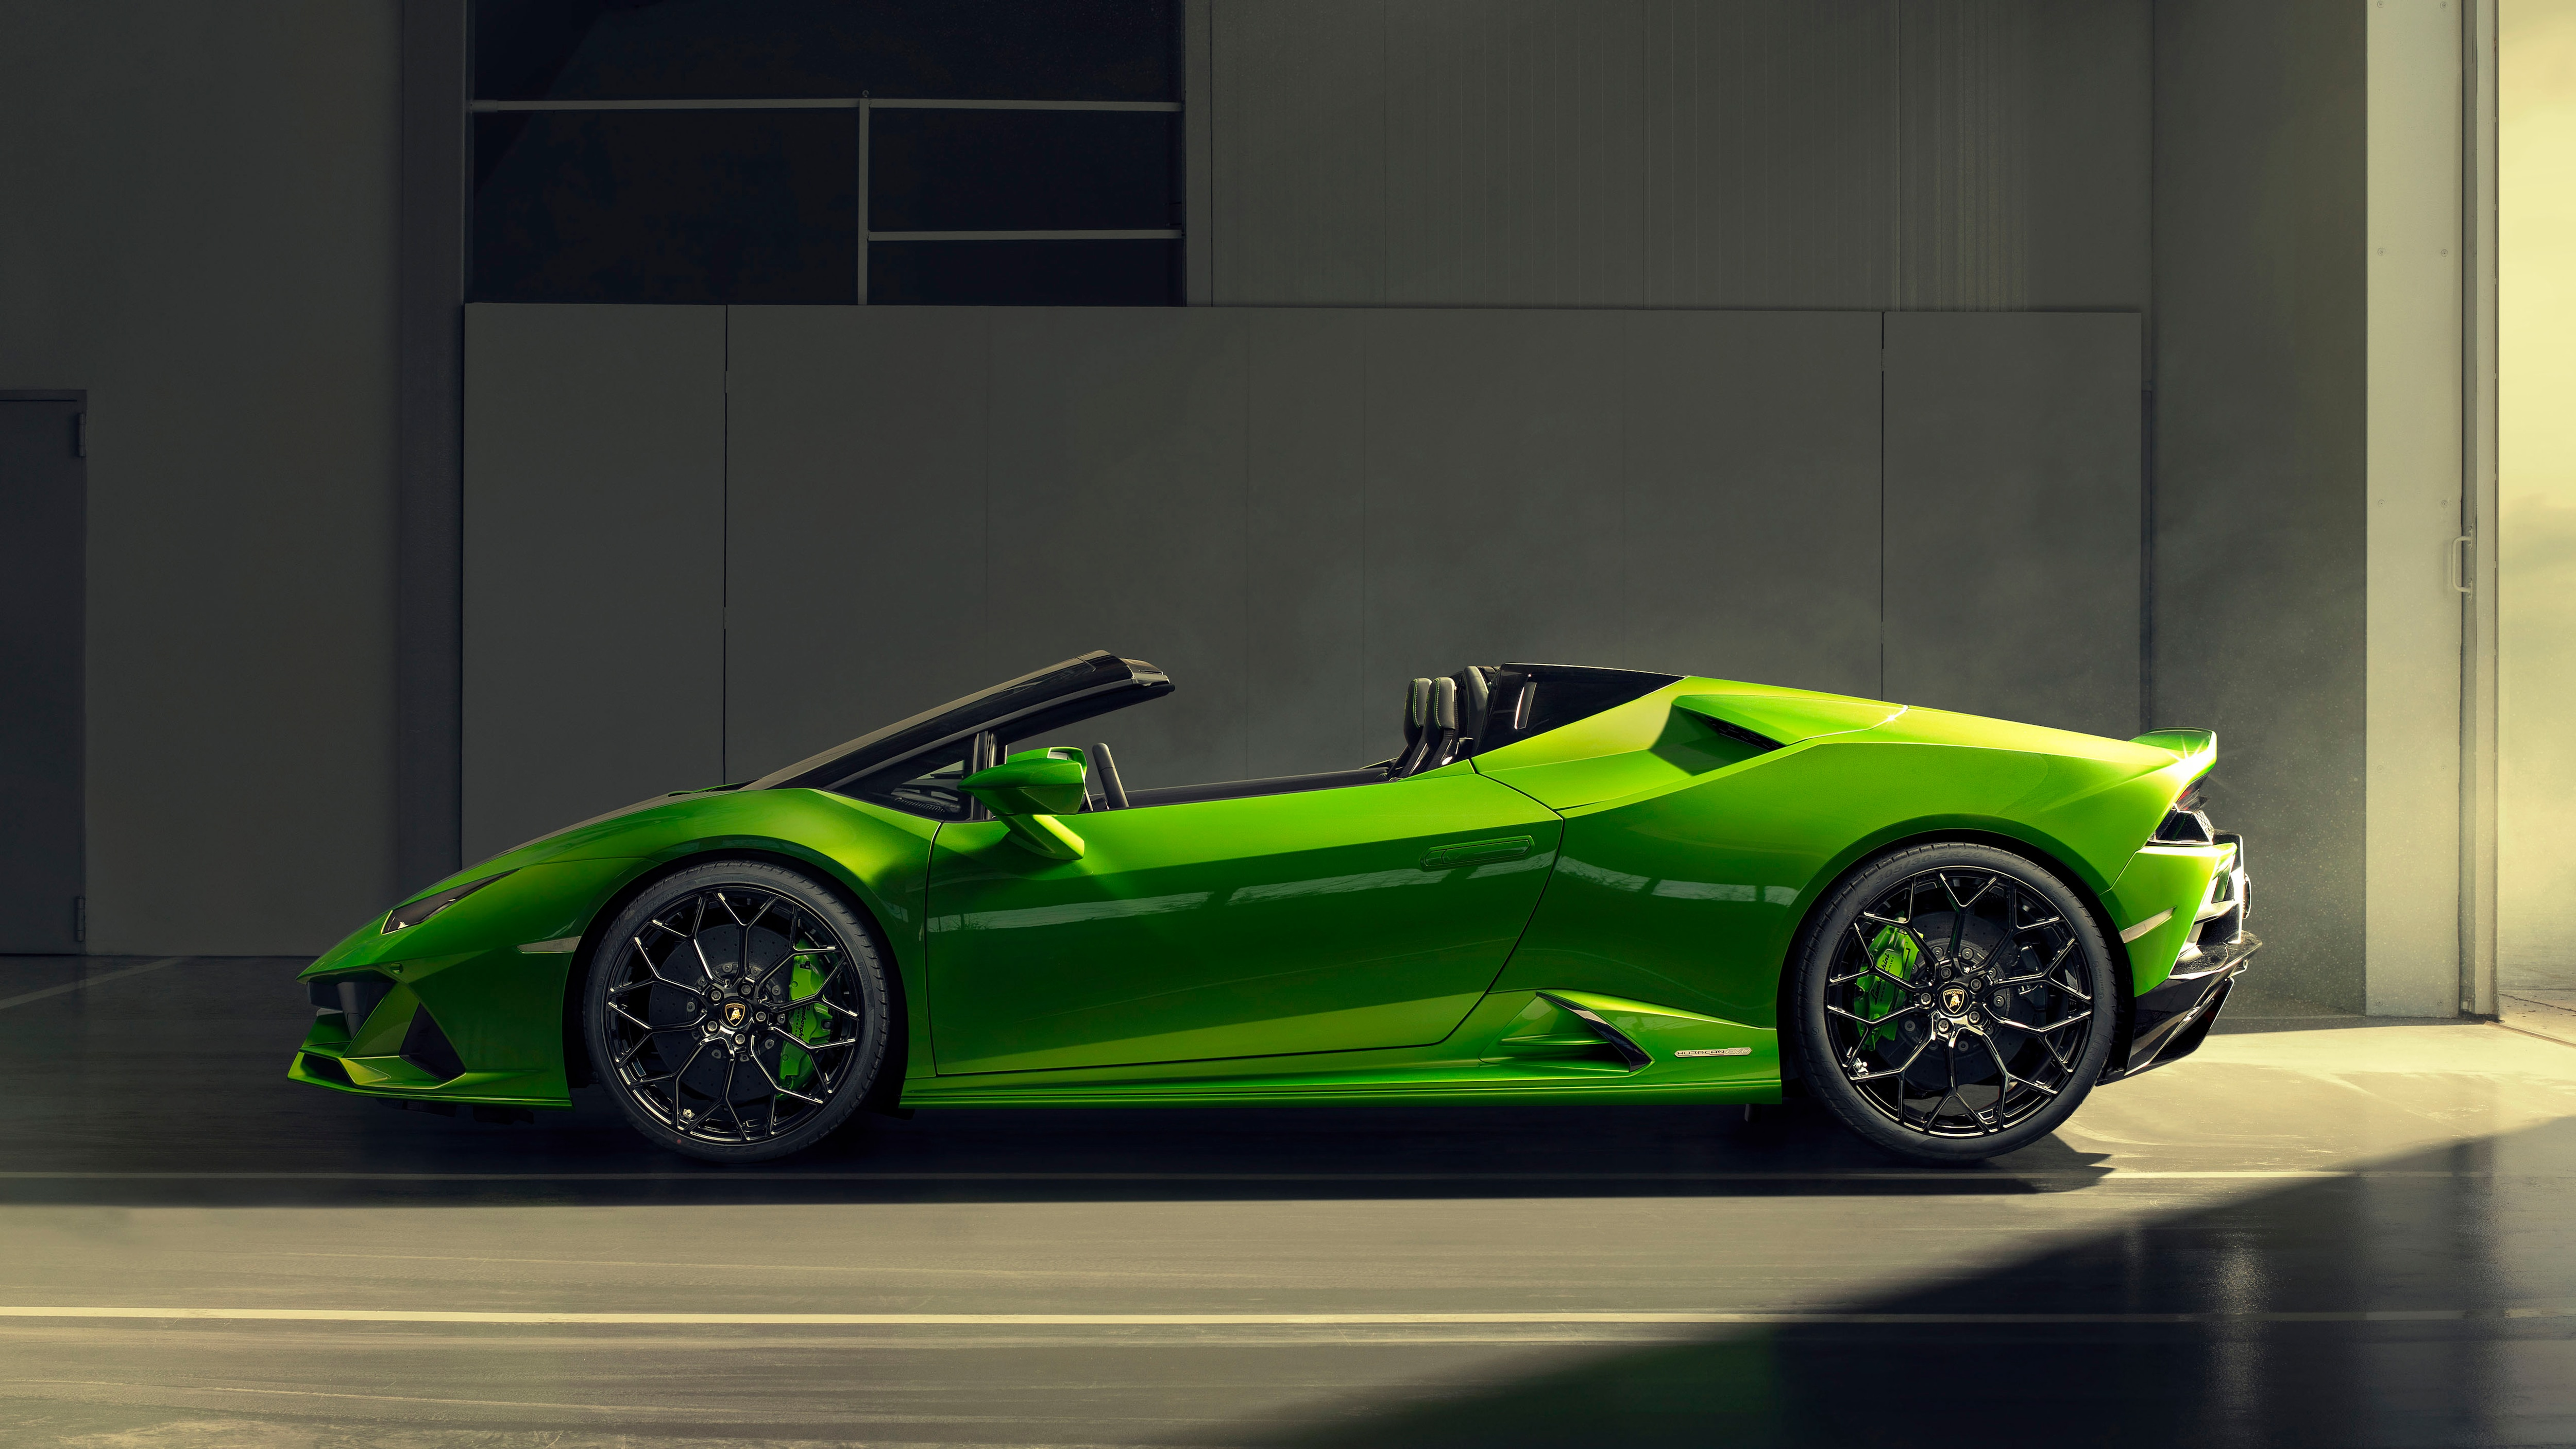 Lamborghini Huracan Evo Spyder Debuts 630 Hp And 201 Mph